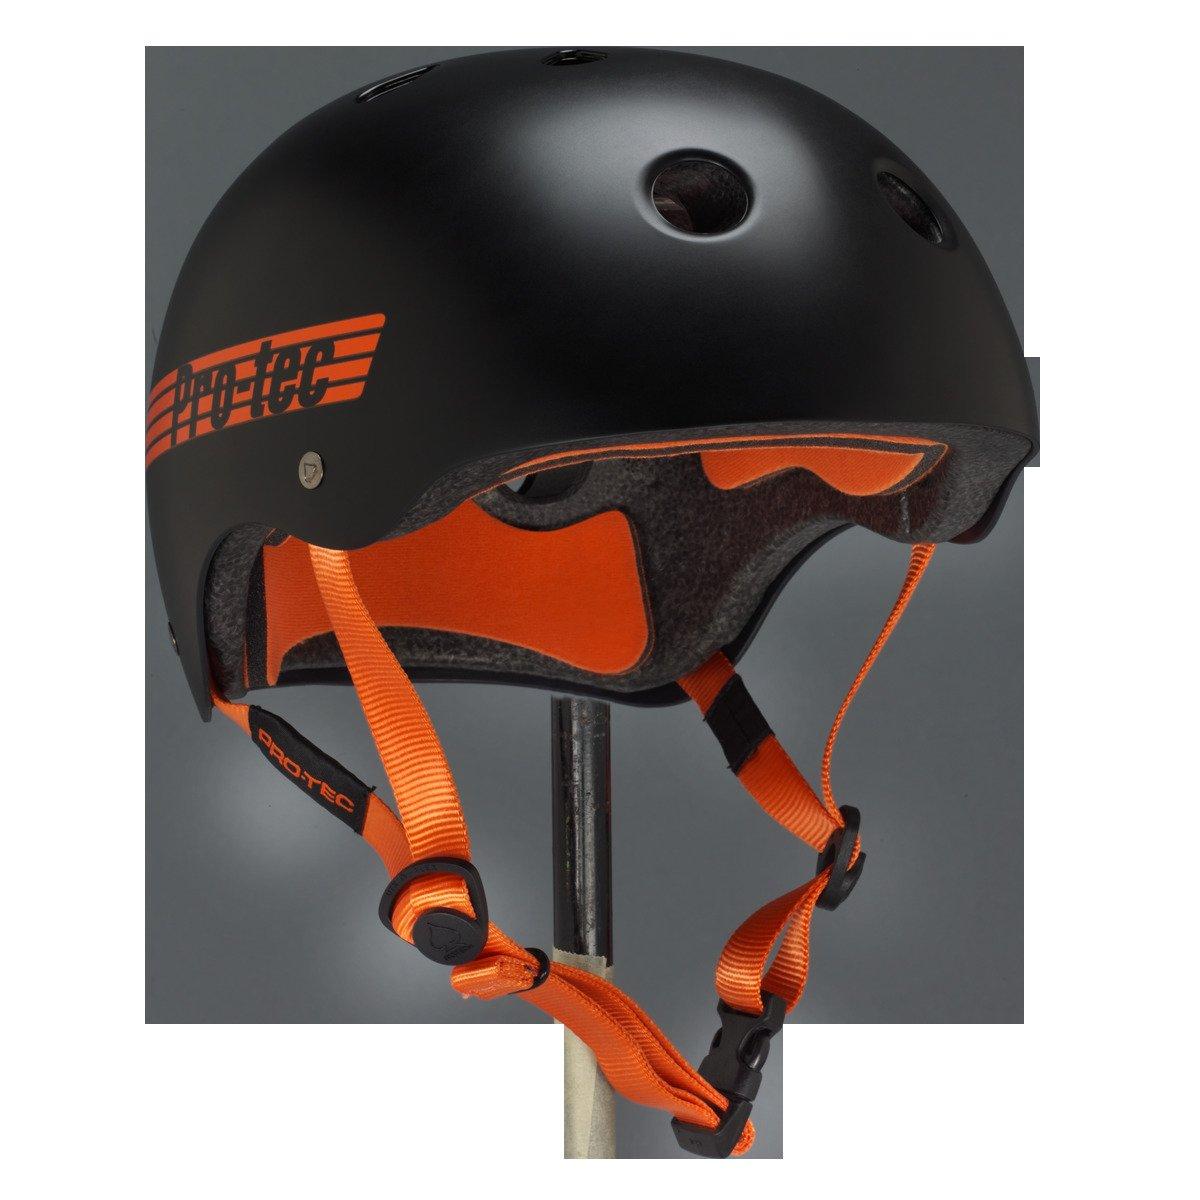 "ProTec Classic Bucky Lasek CPSC Black / Orange Skateboard Helmet - (Certified) - X-Large / 23.6"" - 24.4"""